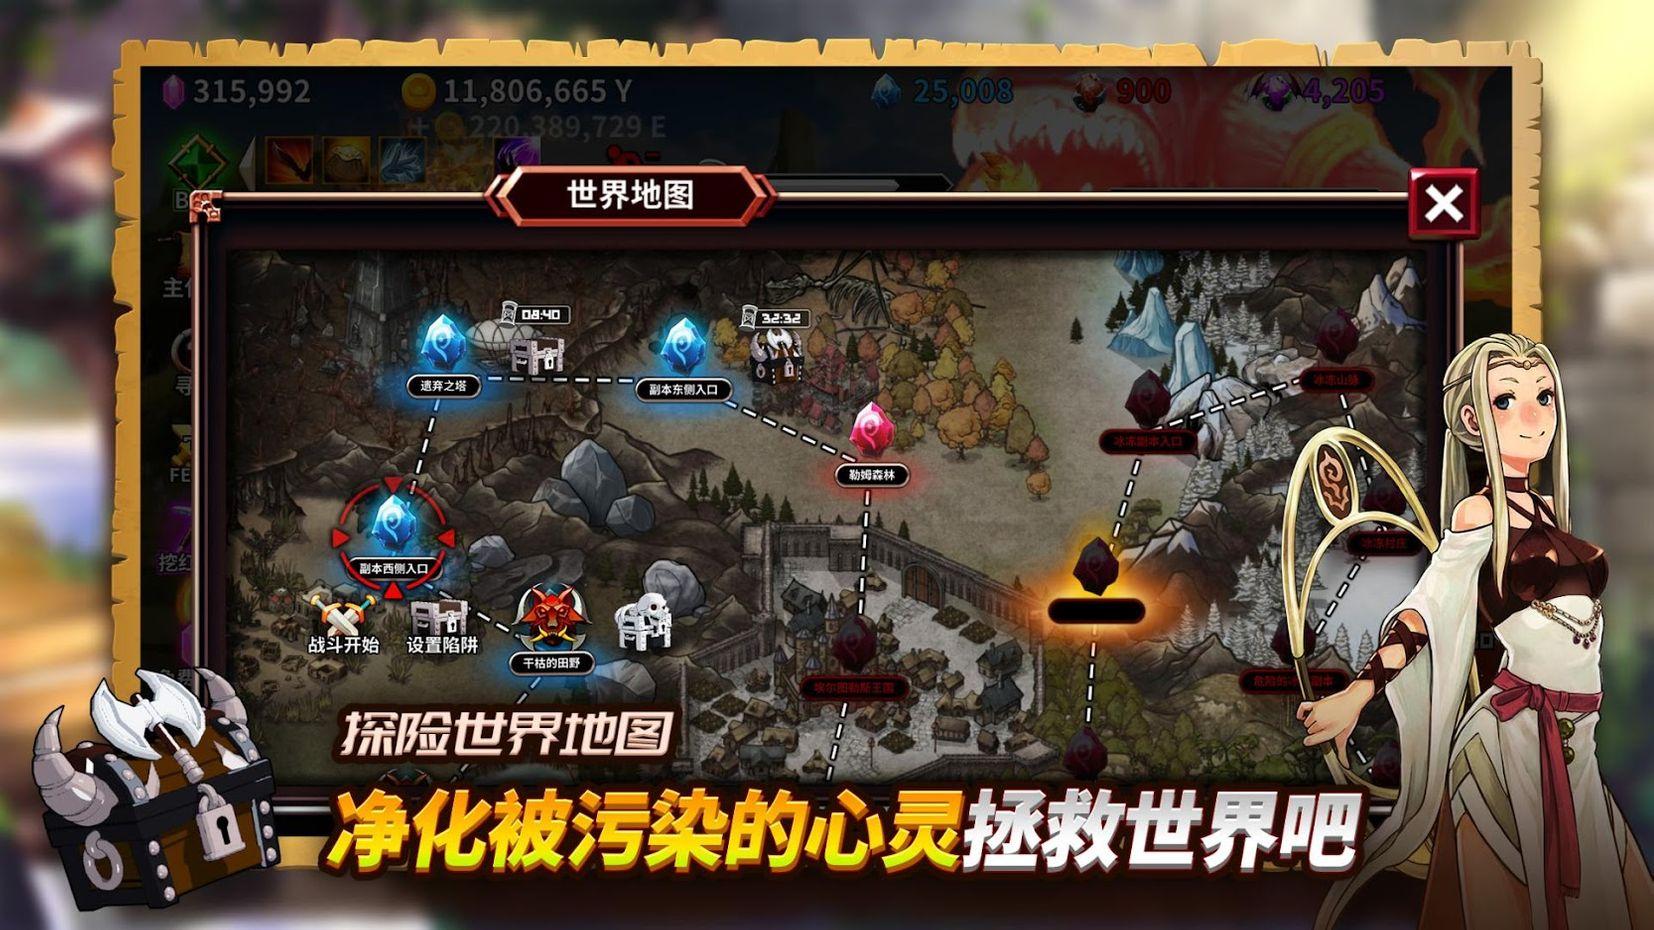 Screenshots - 被诅咒的箱子勇士